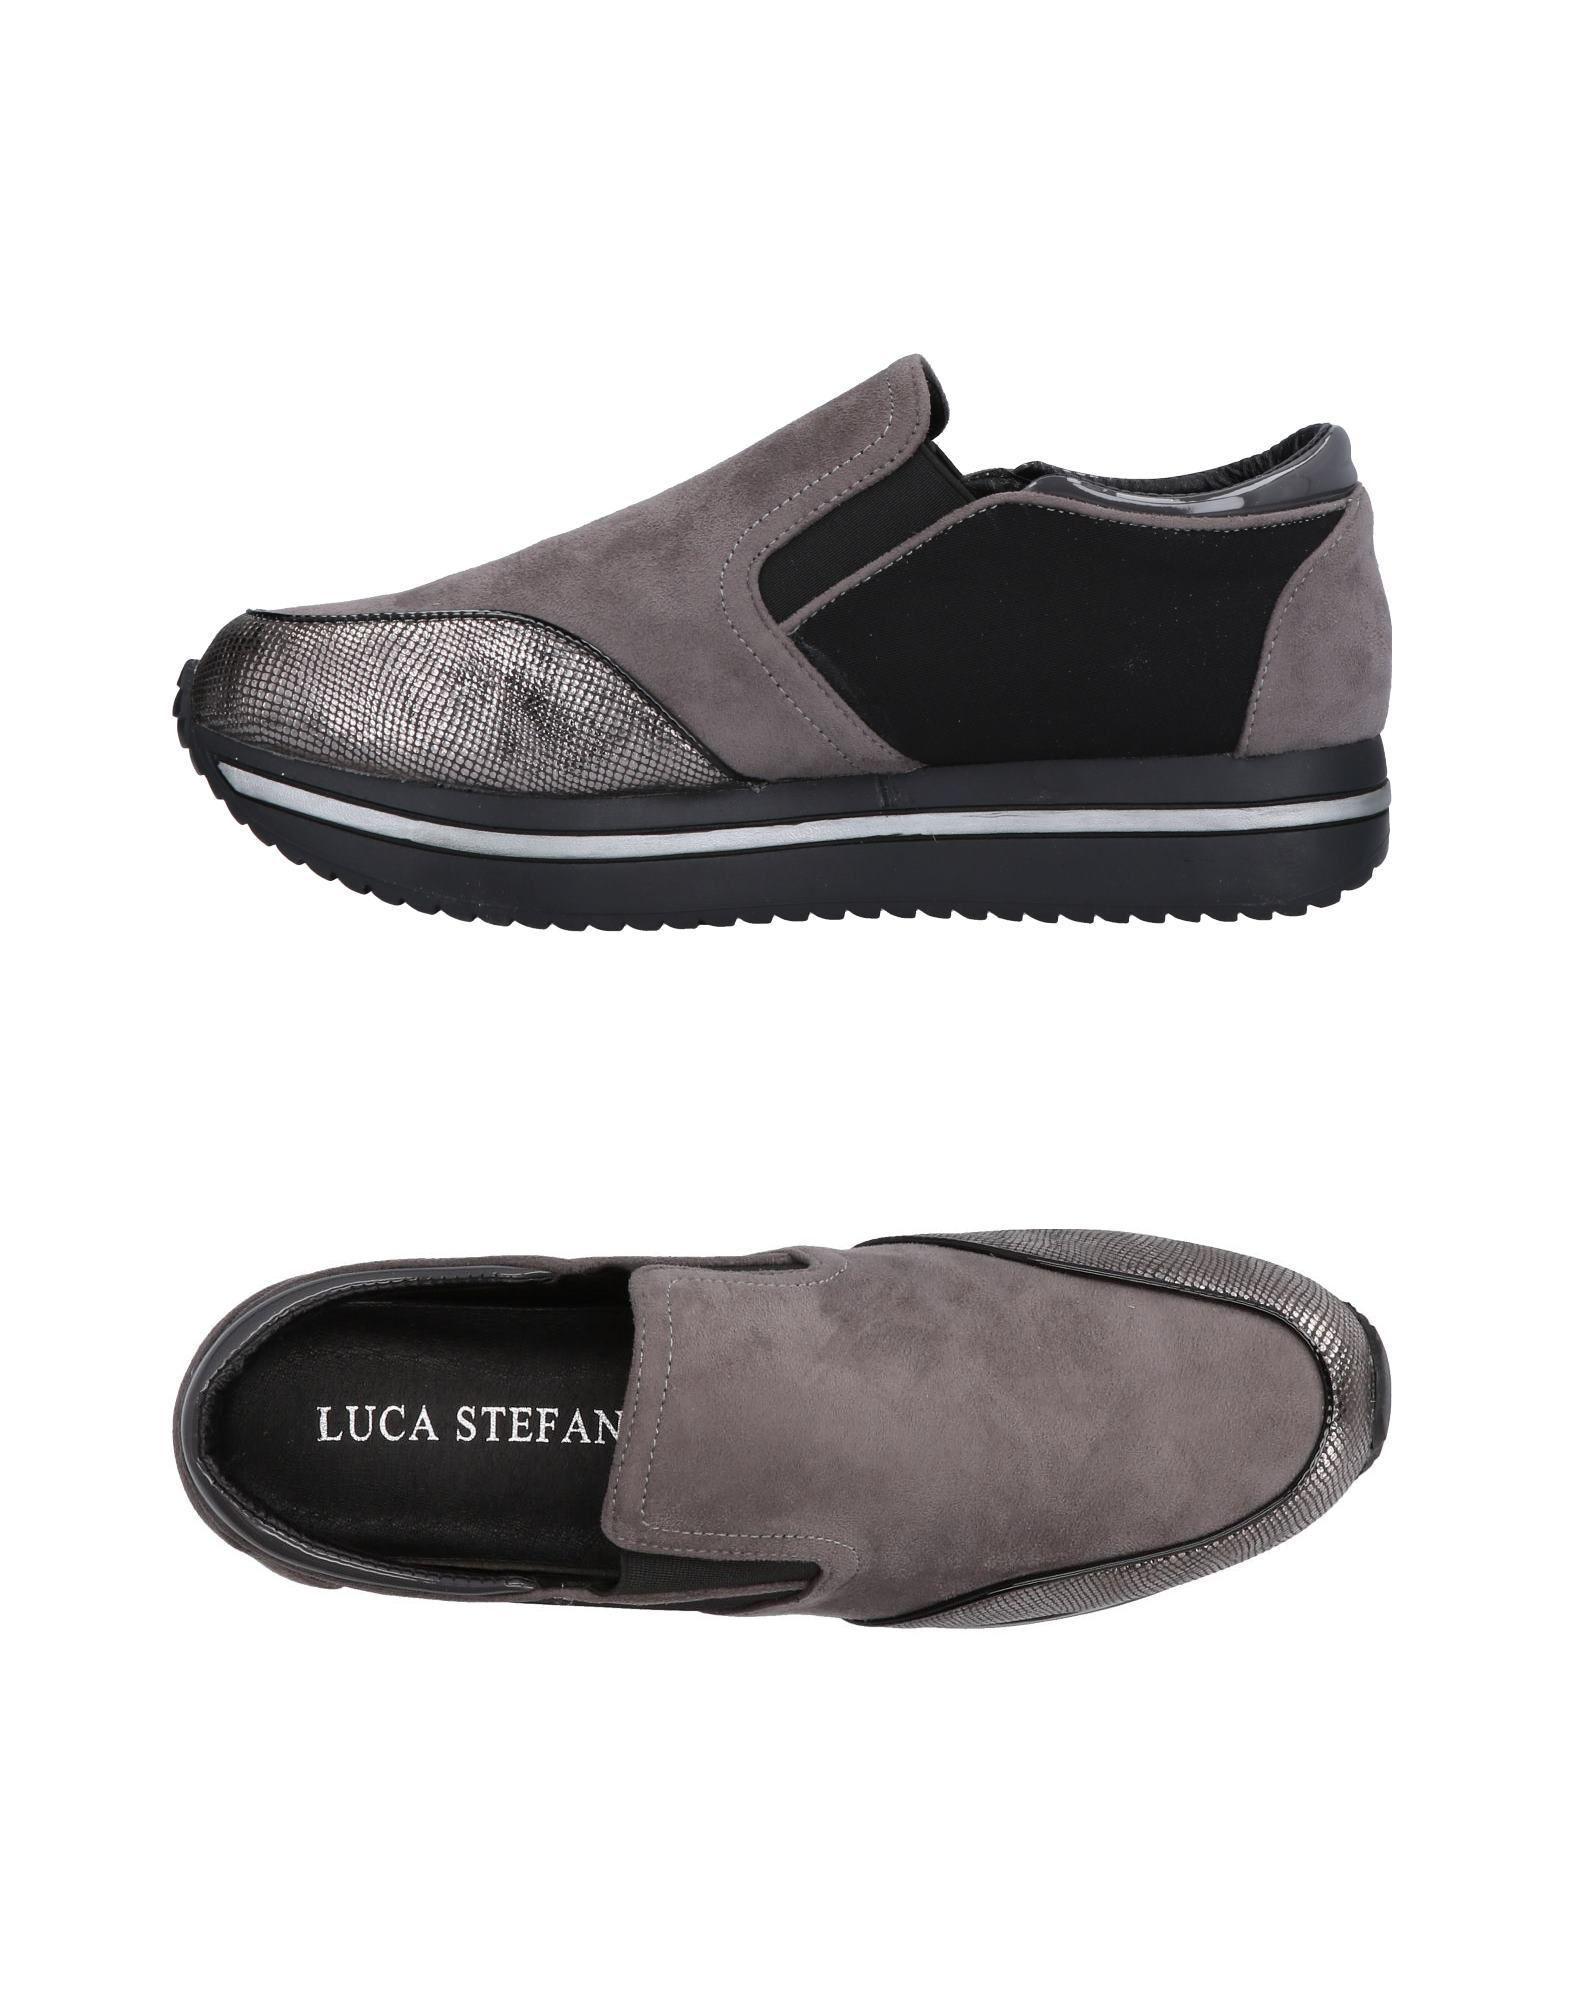 Luca Stefani Bas-tops Et Chaussures De Sport tIjKqy1r